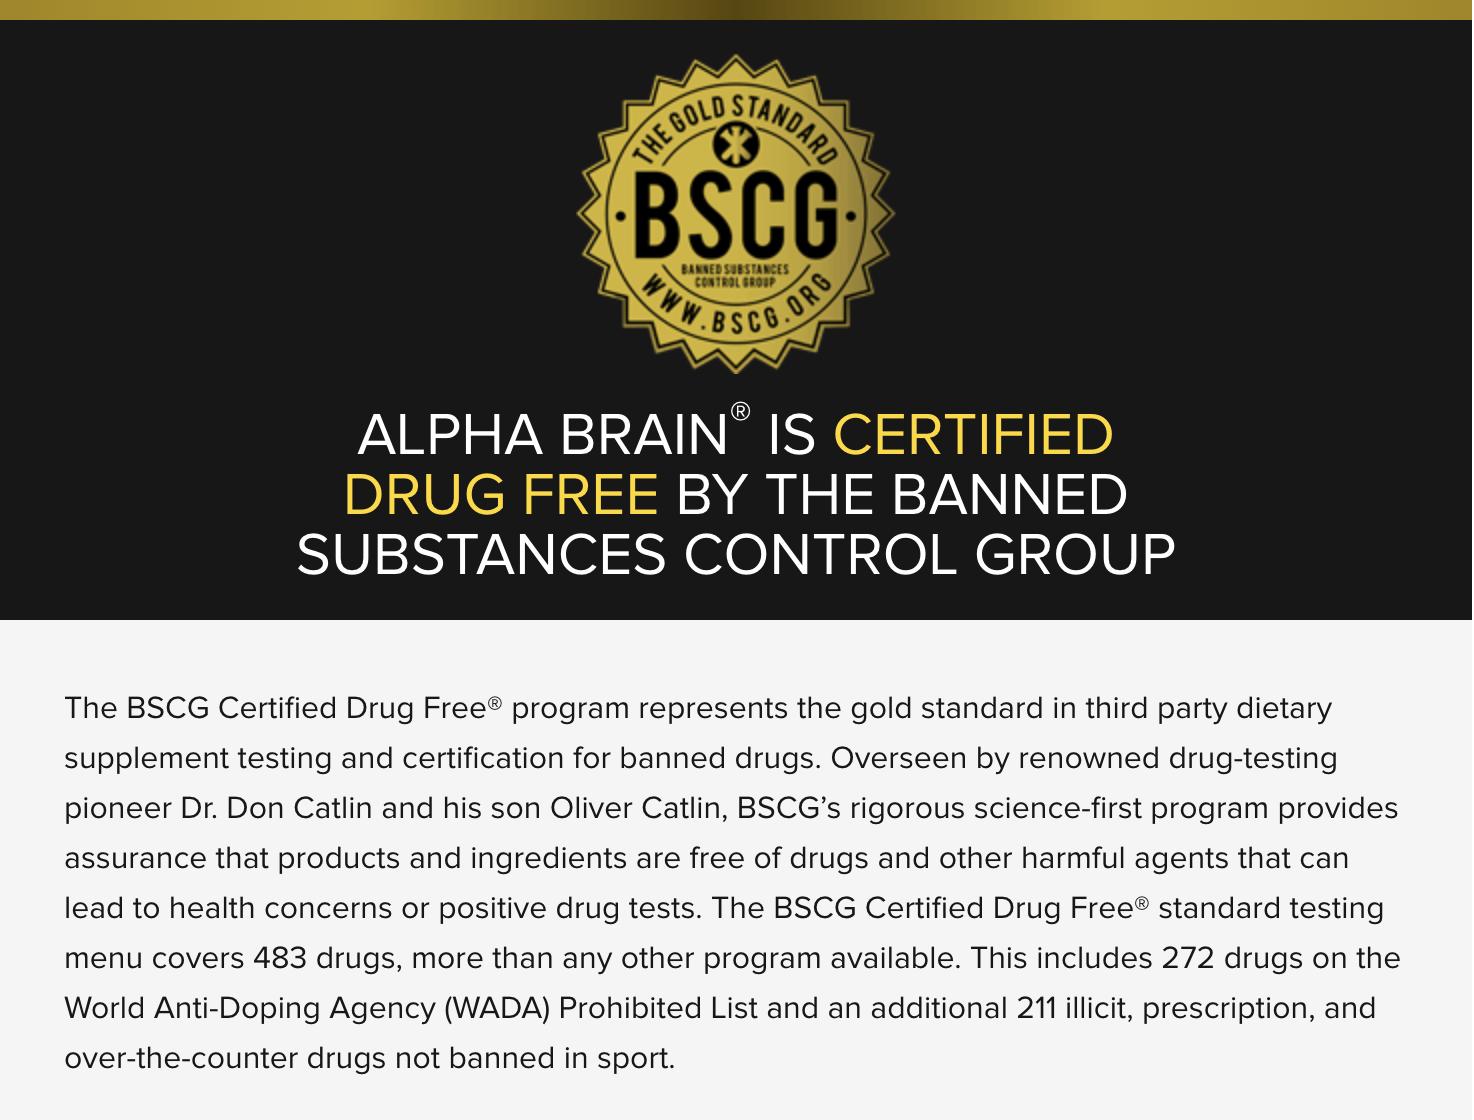 Onit BSCG Certified Drug Free seal